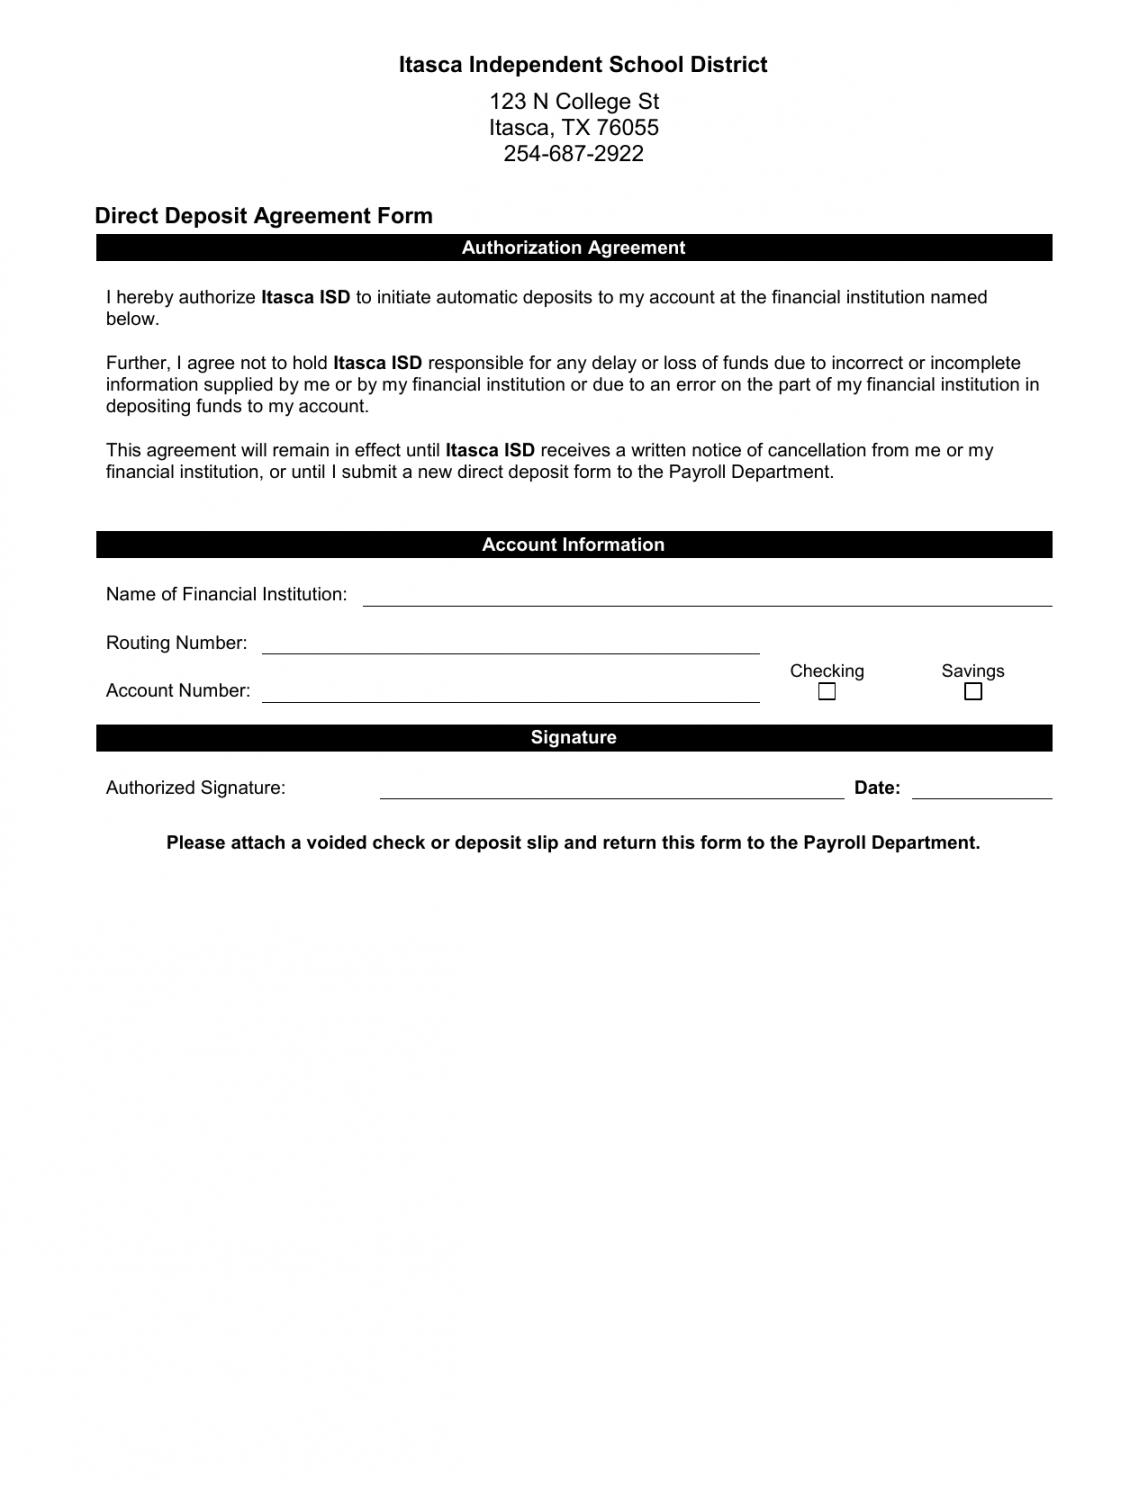 sample direct deposit agreement form authorization agreement for direct deposit word